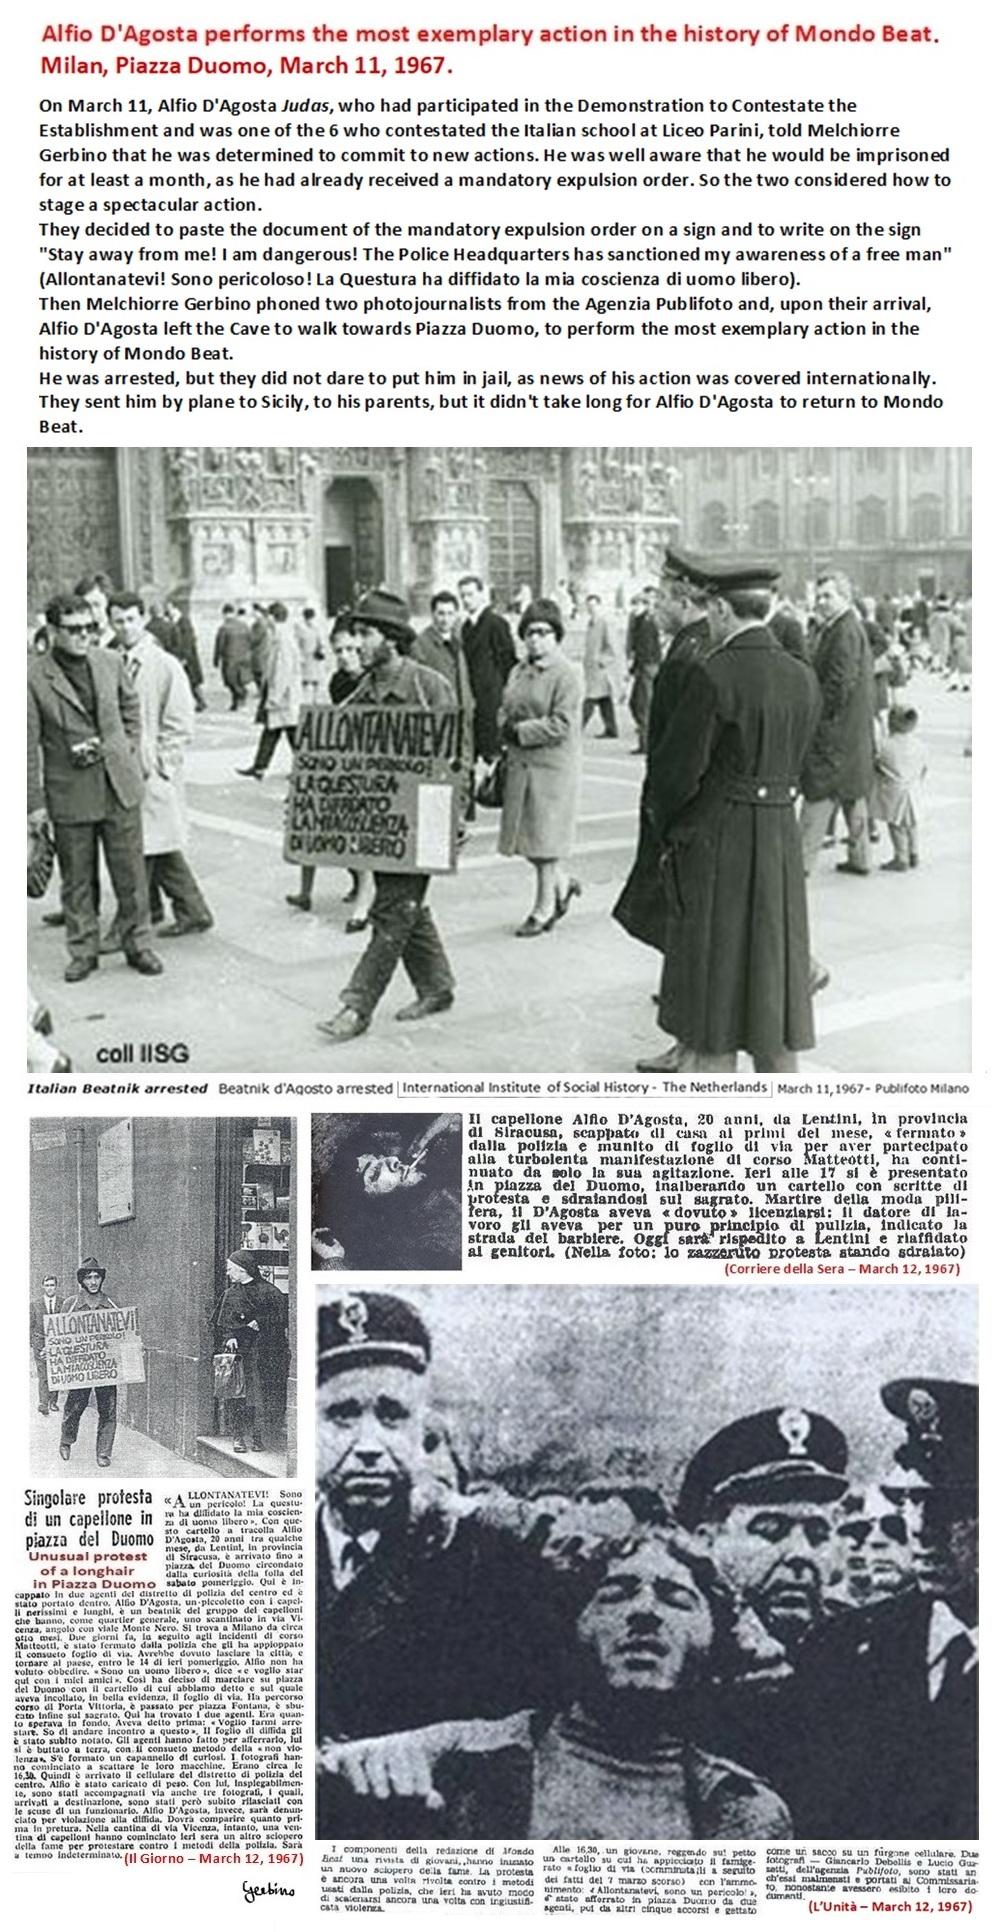 Alfio D'Agosta's contestation was covered internationally